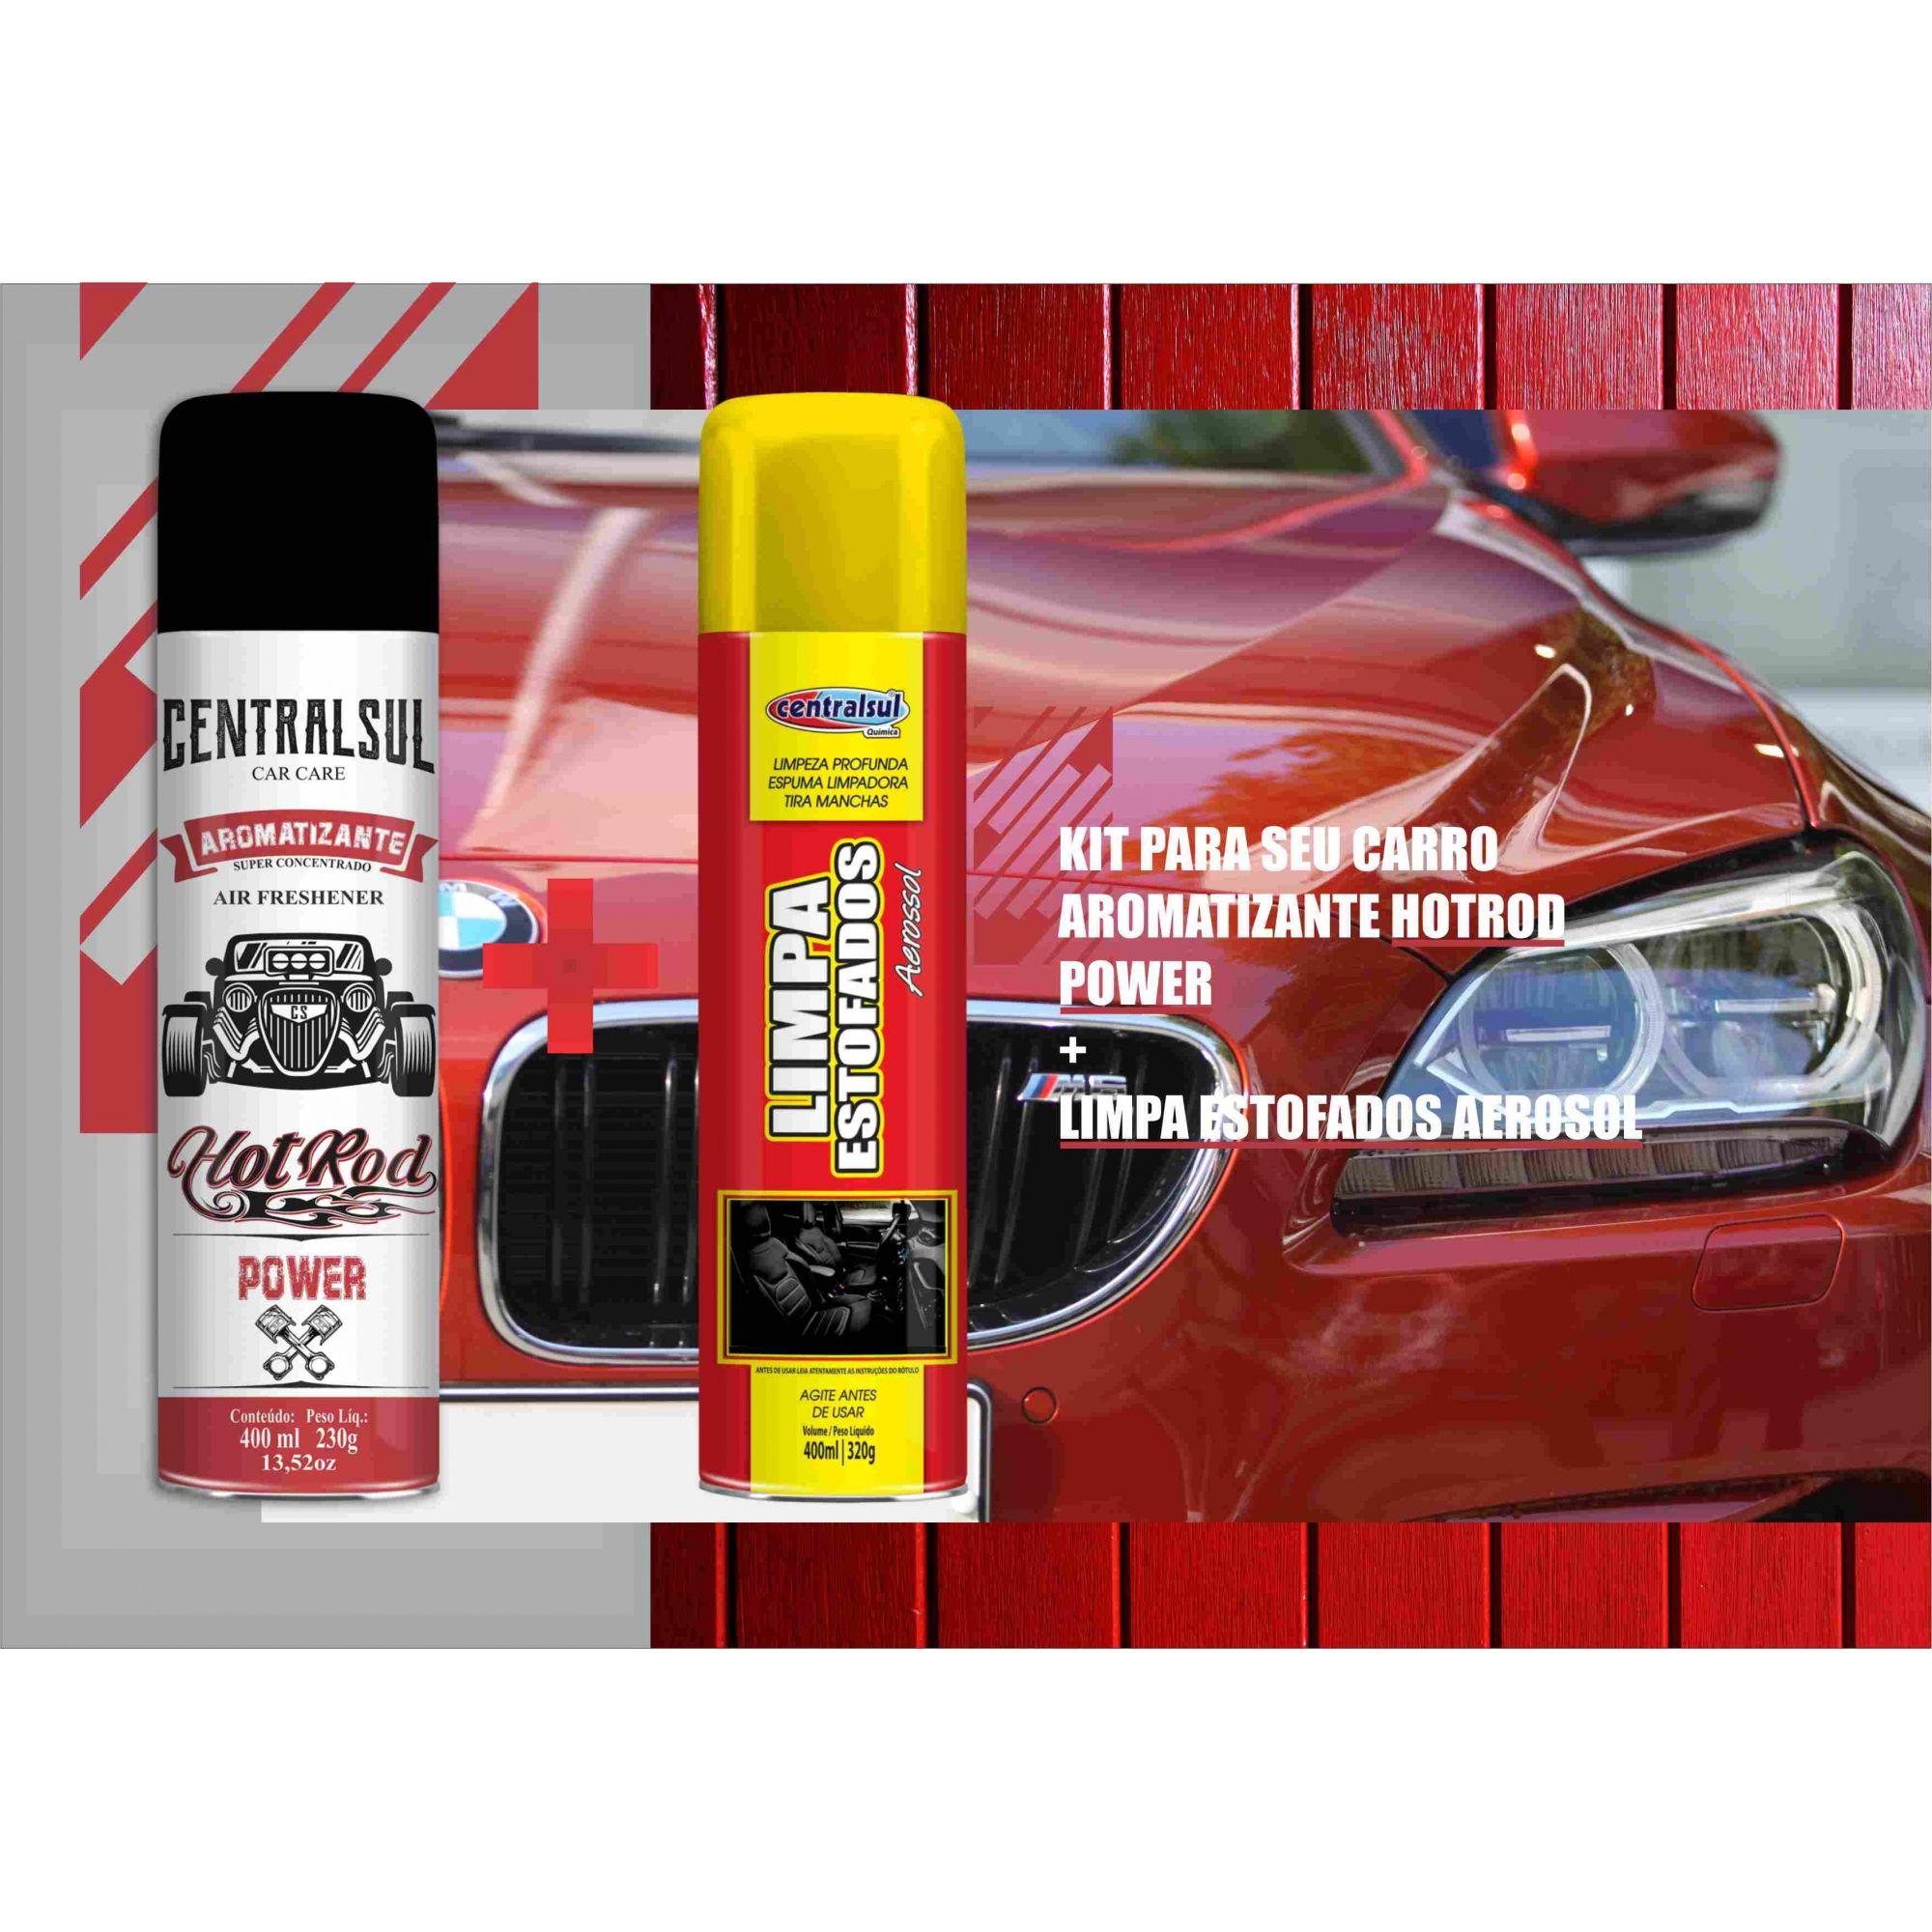 Aromatizante Super Concentrado + Limpa Estofados  - Rea Comércio - Sua Loja Completa!